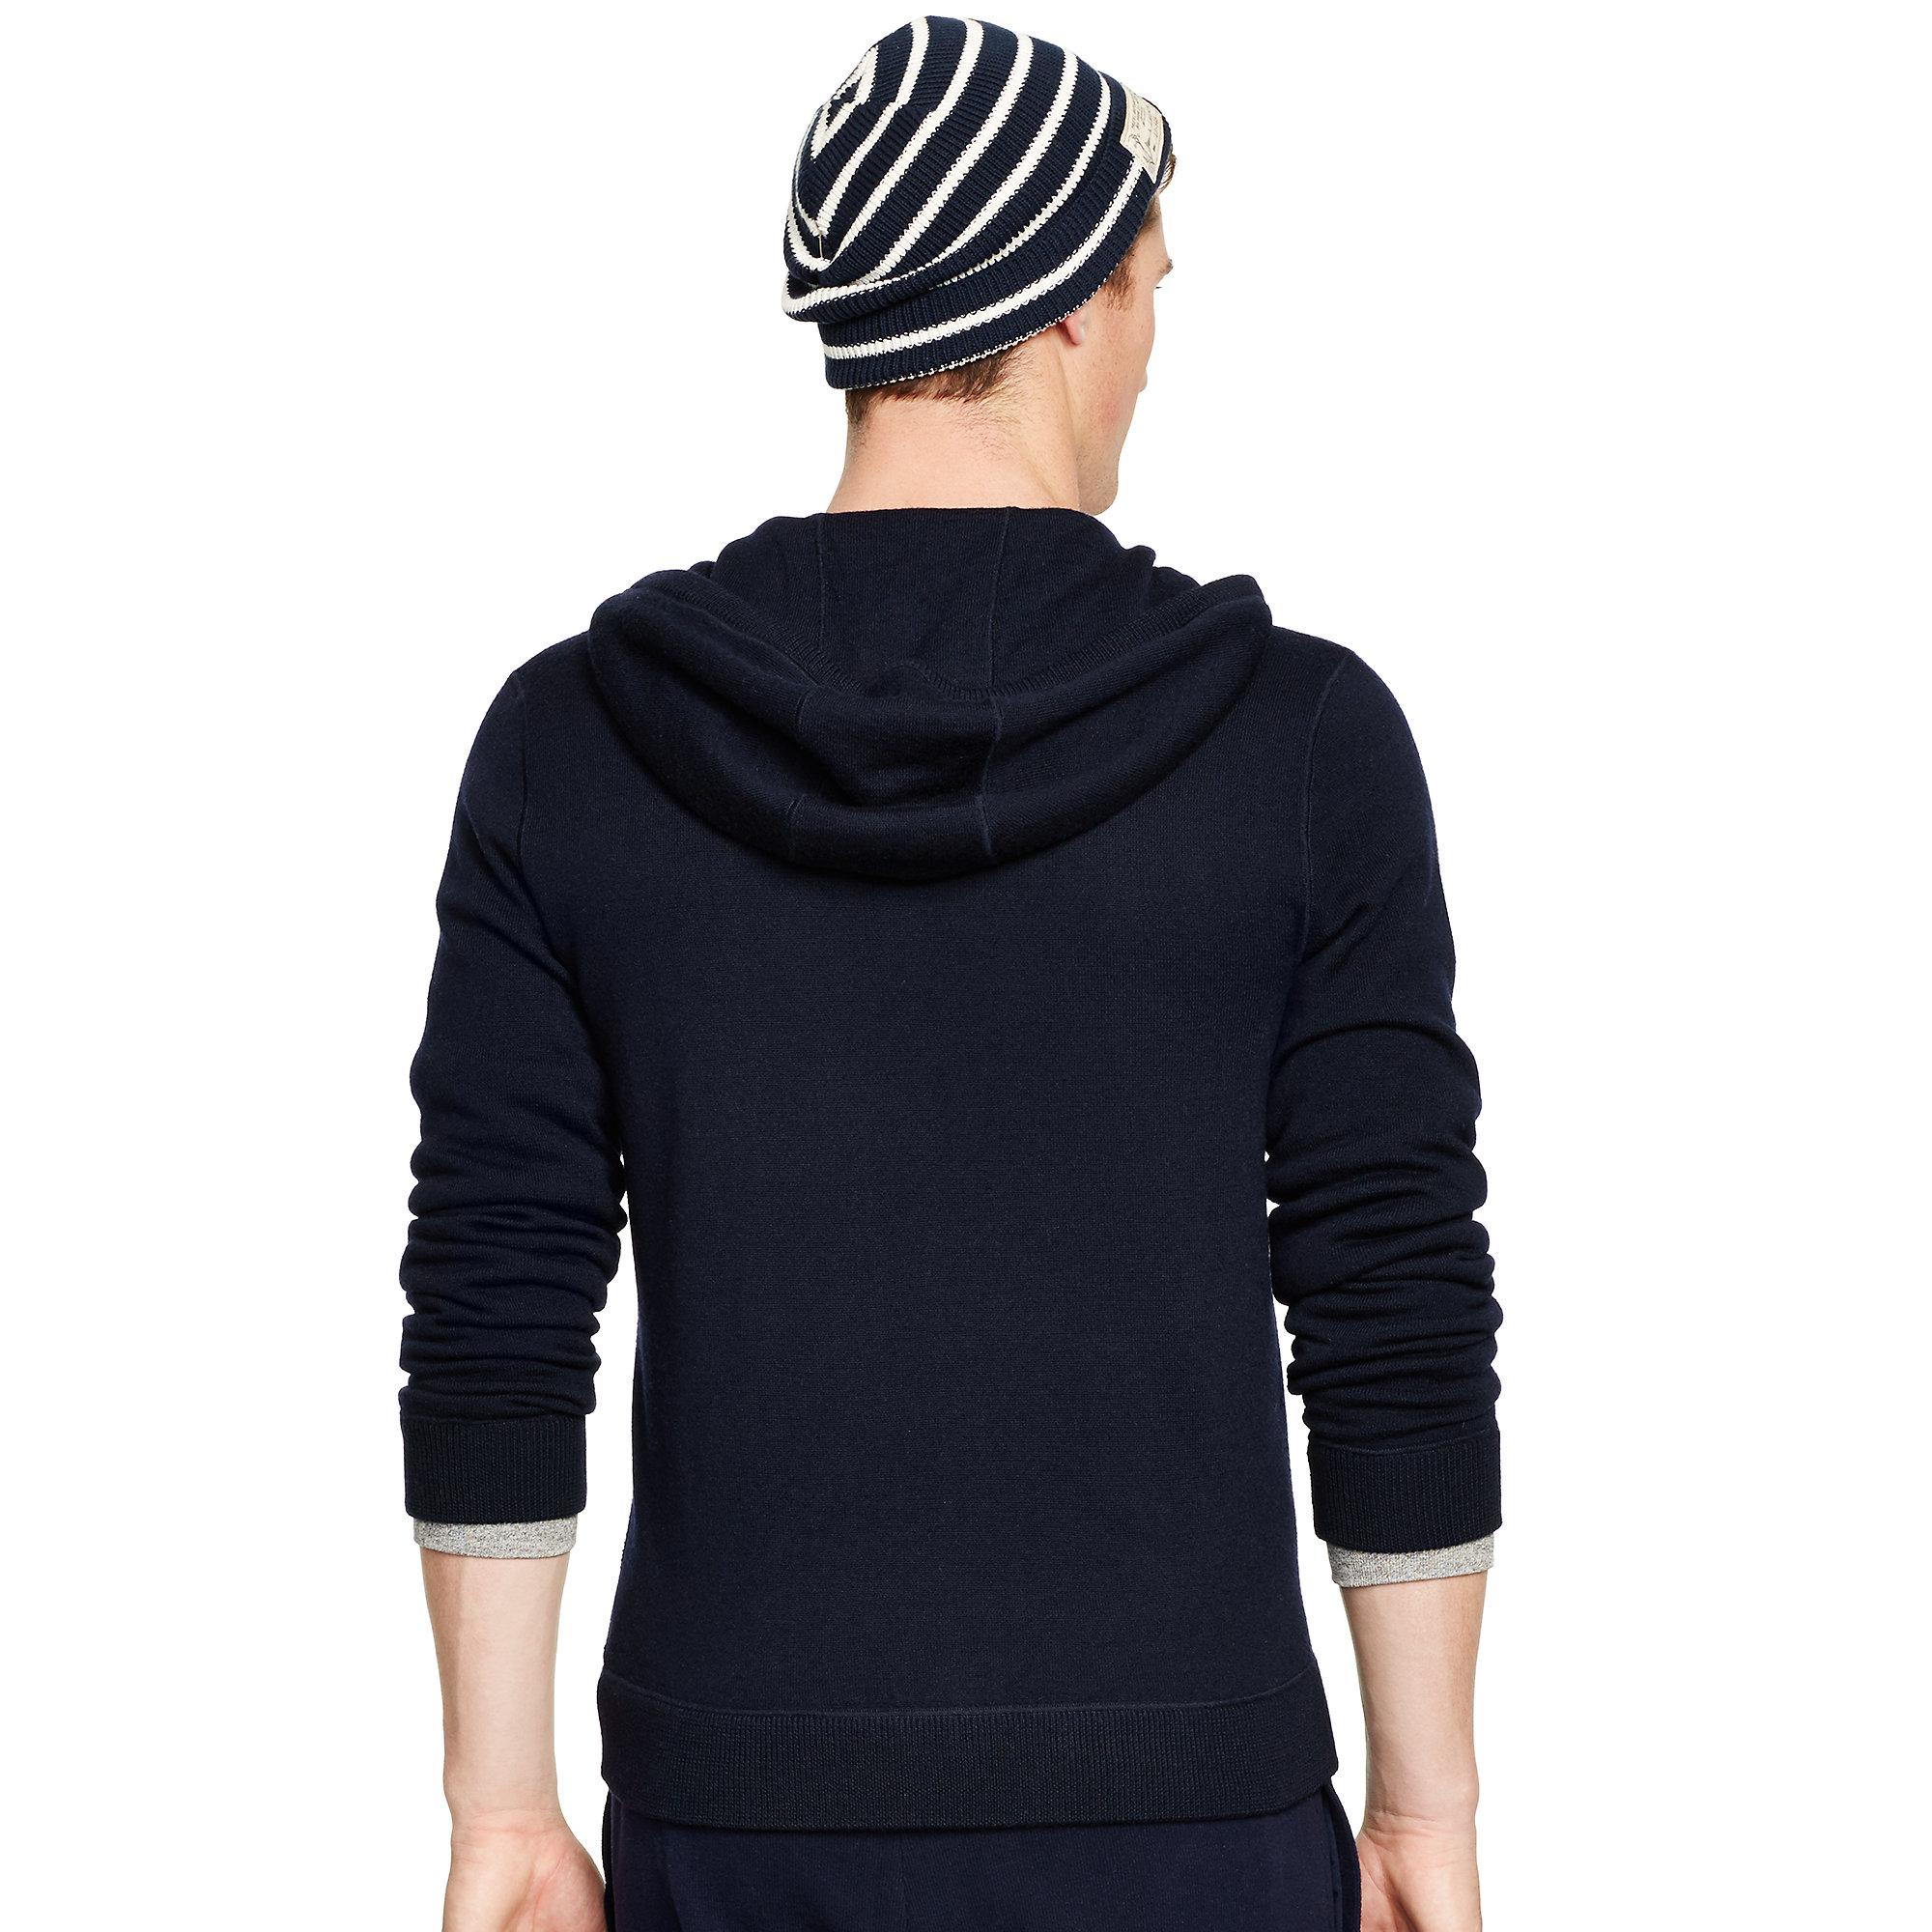 polo ralph lauren merino wool full zip hoodie in blue for men lyst. Black Bedroom Furniture Sets. Home Design Ideas